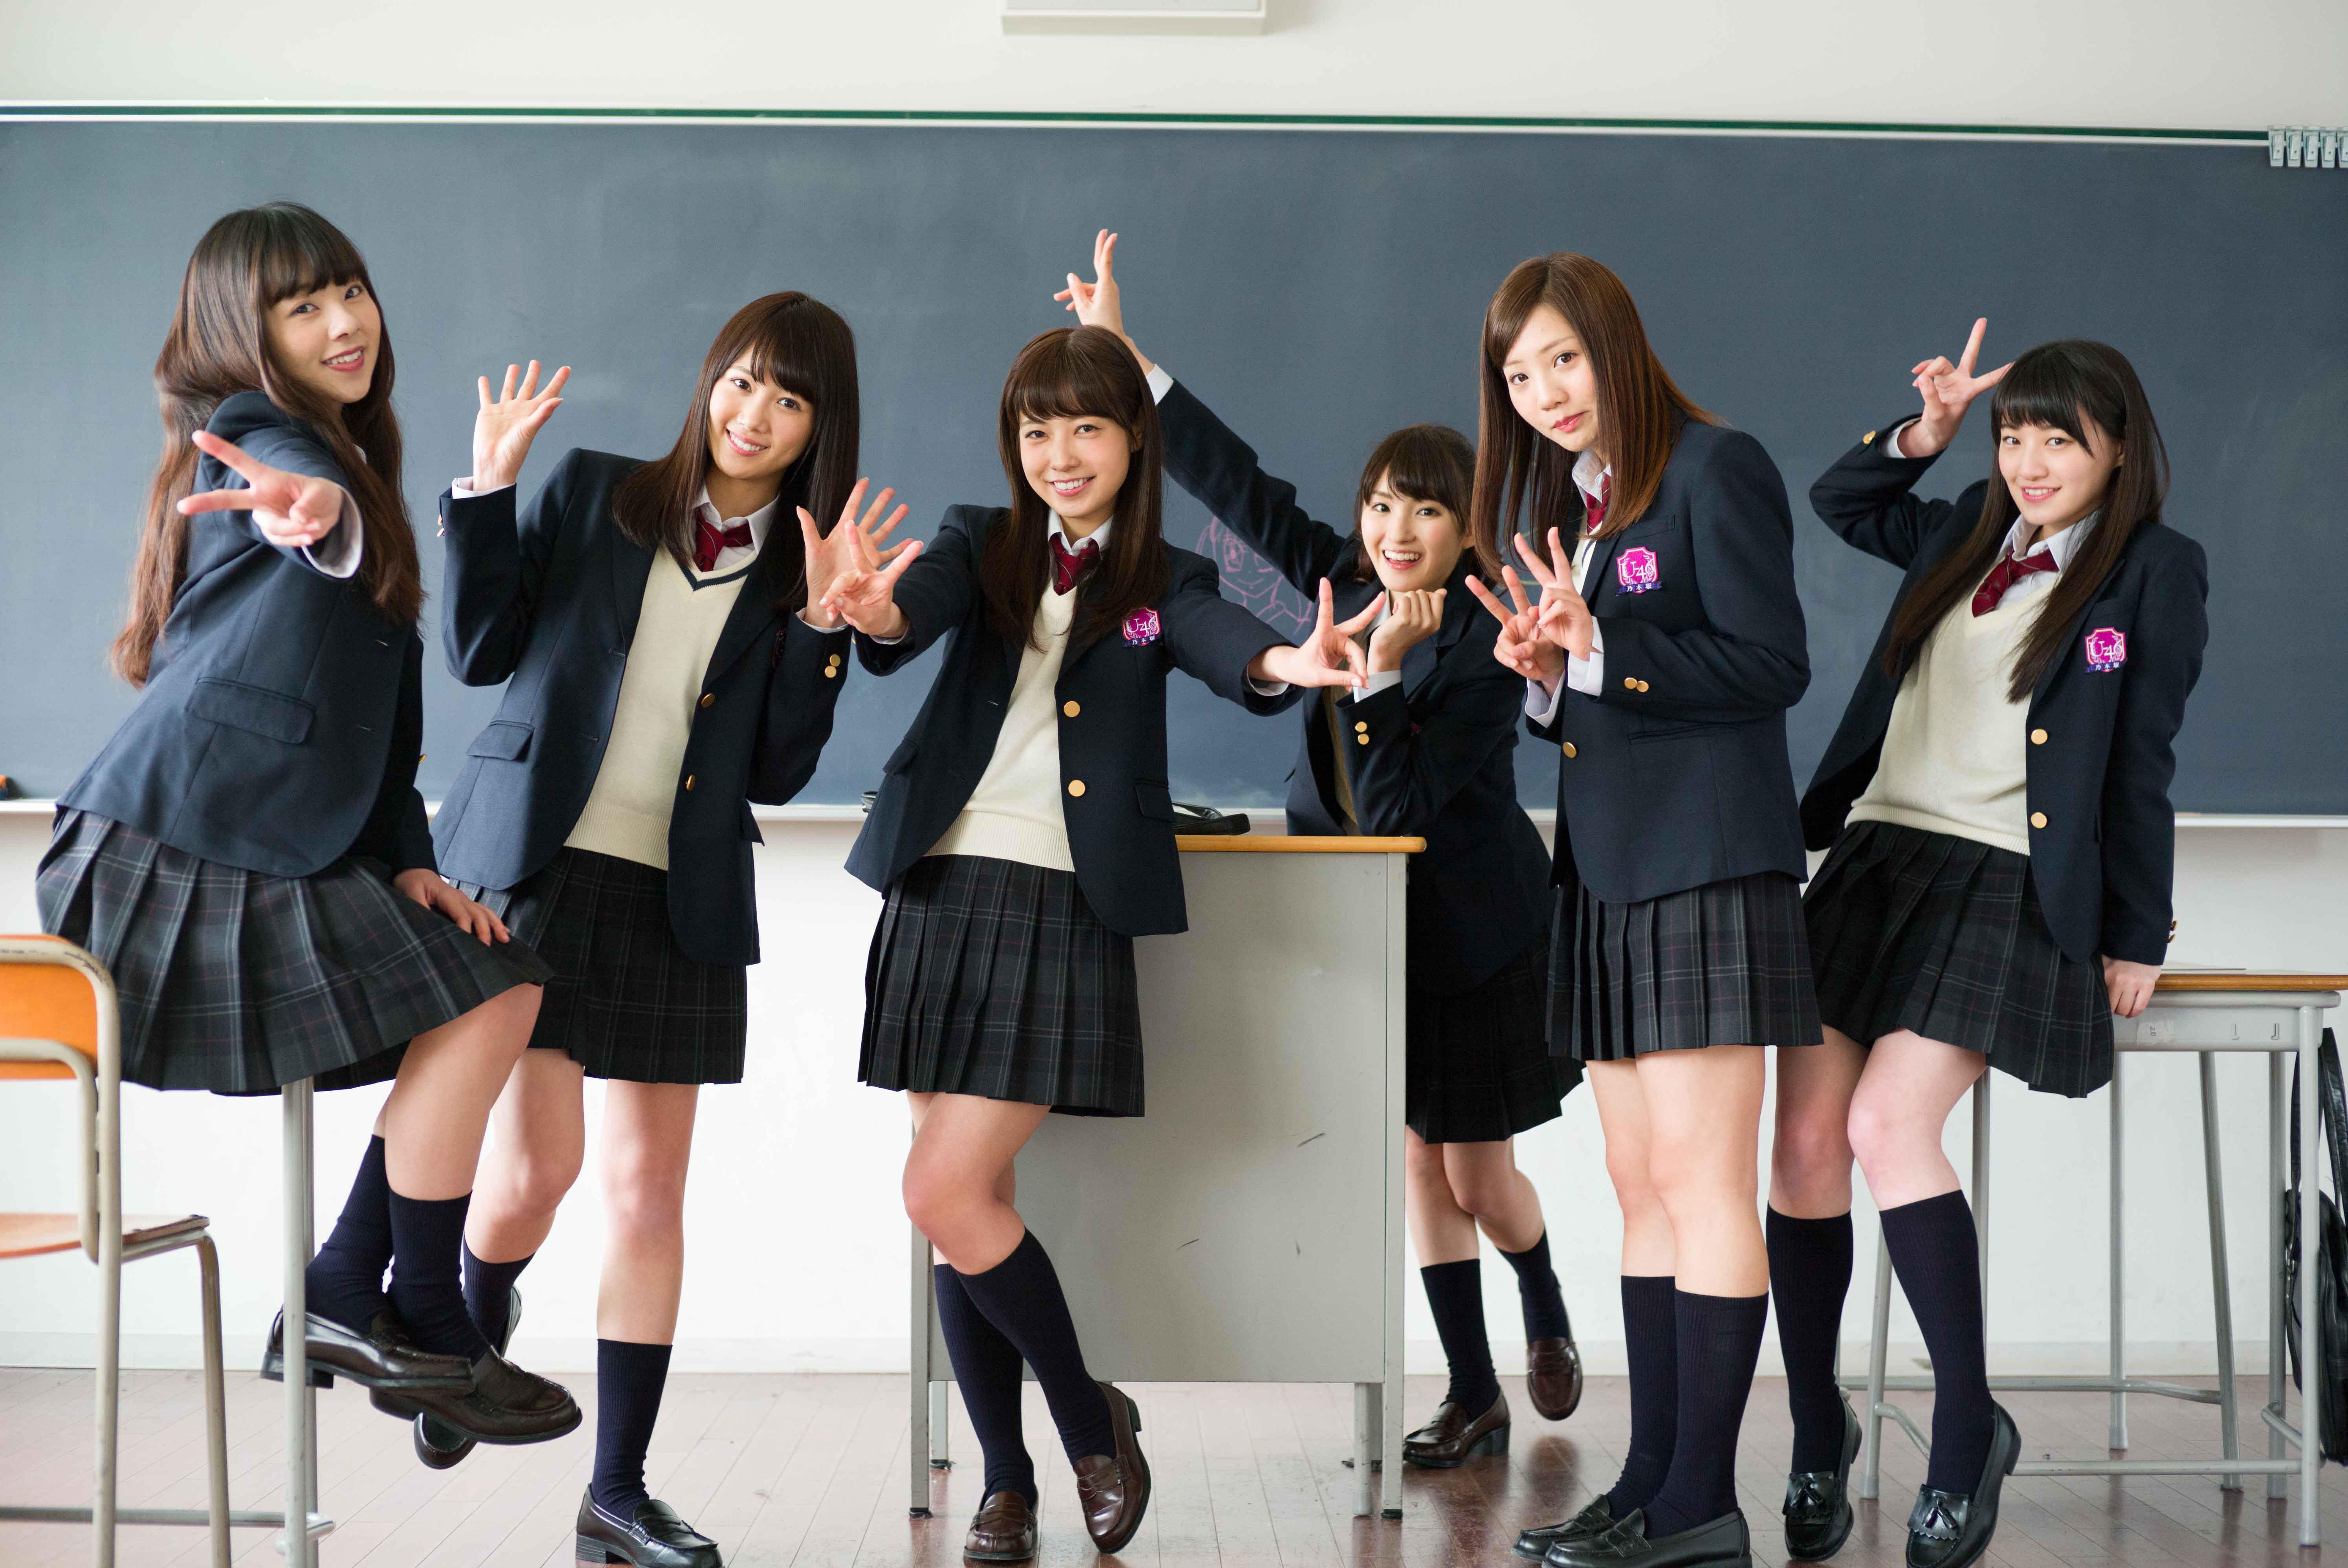 A scuola schoolgirl - 5 1